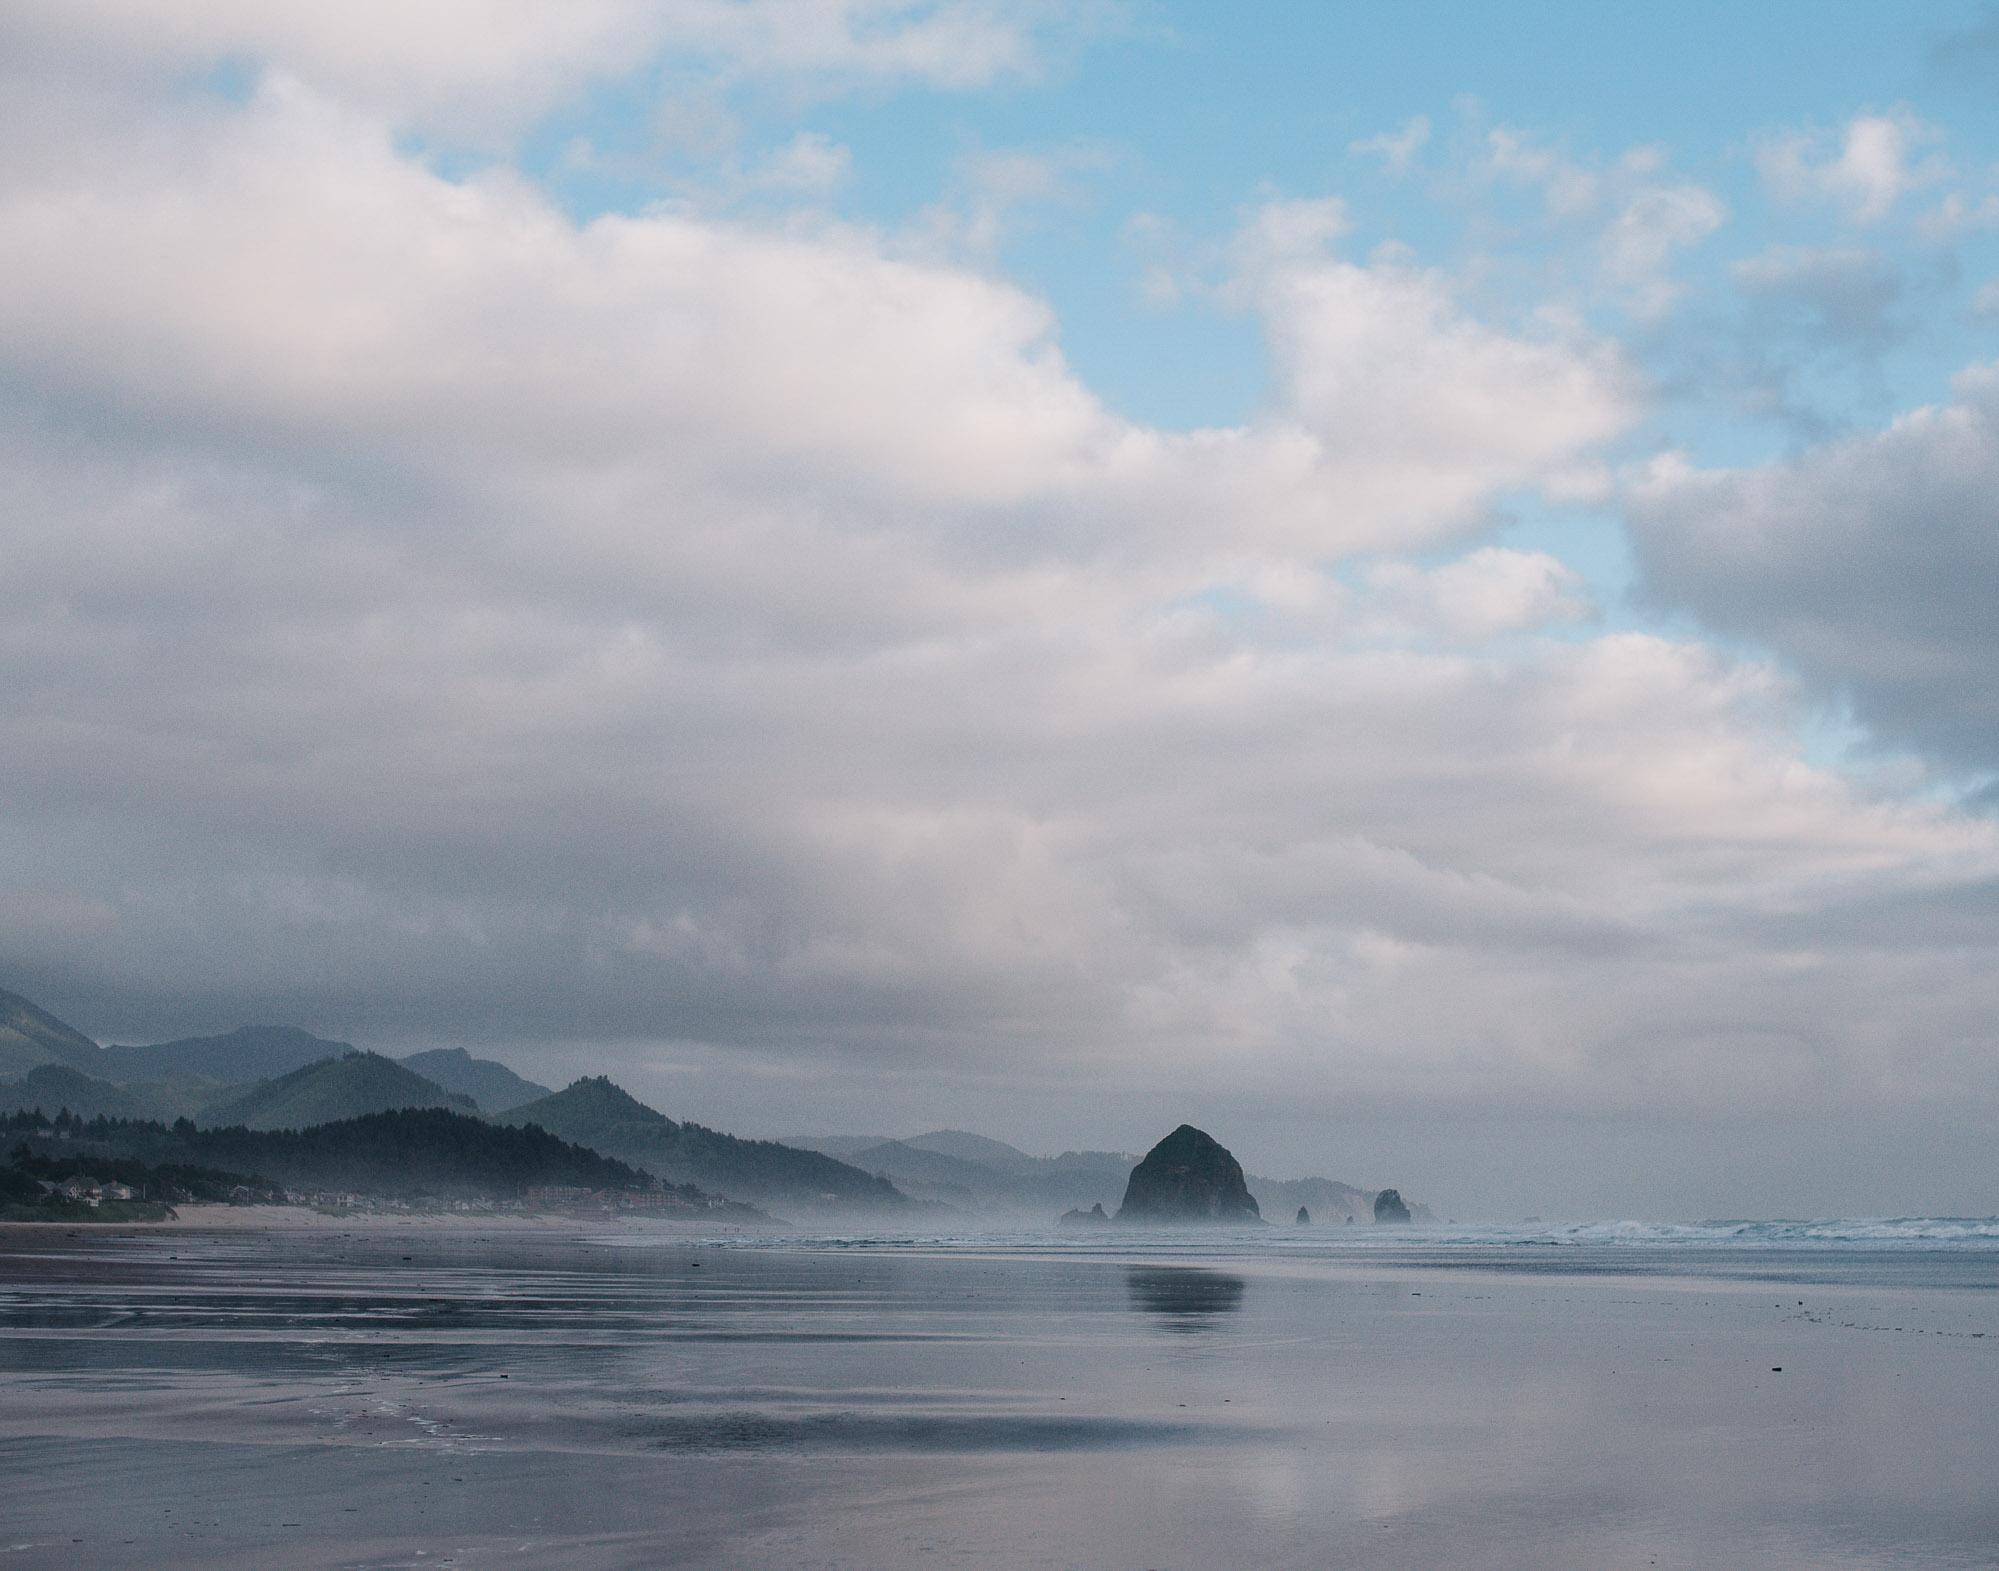 47elopement-photographer-colorado-Cannon-Beach_PNW_photographer_portland-possible-trip-2016-2293.jpg